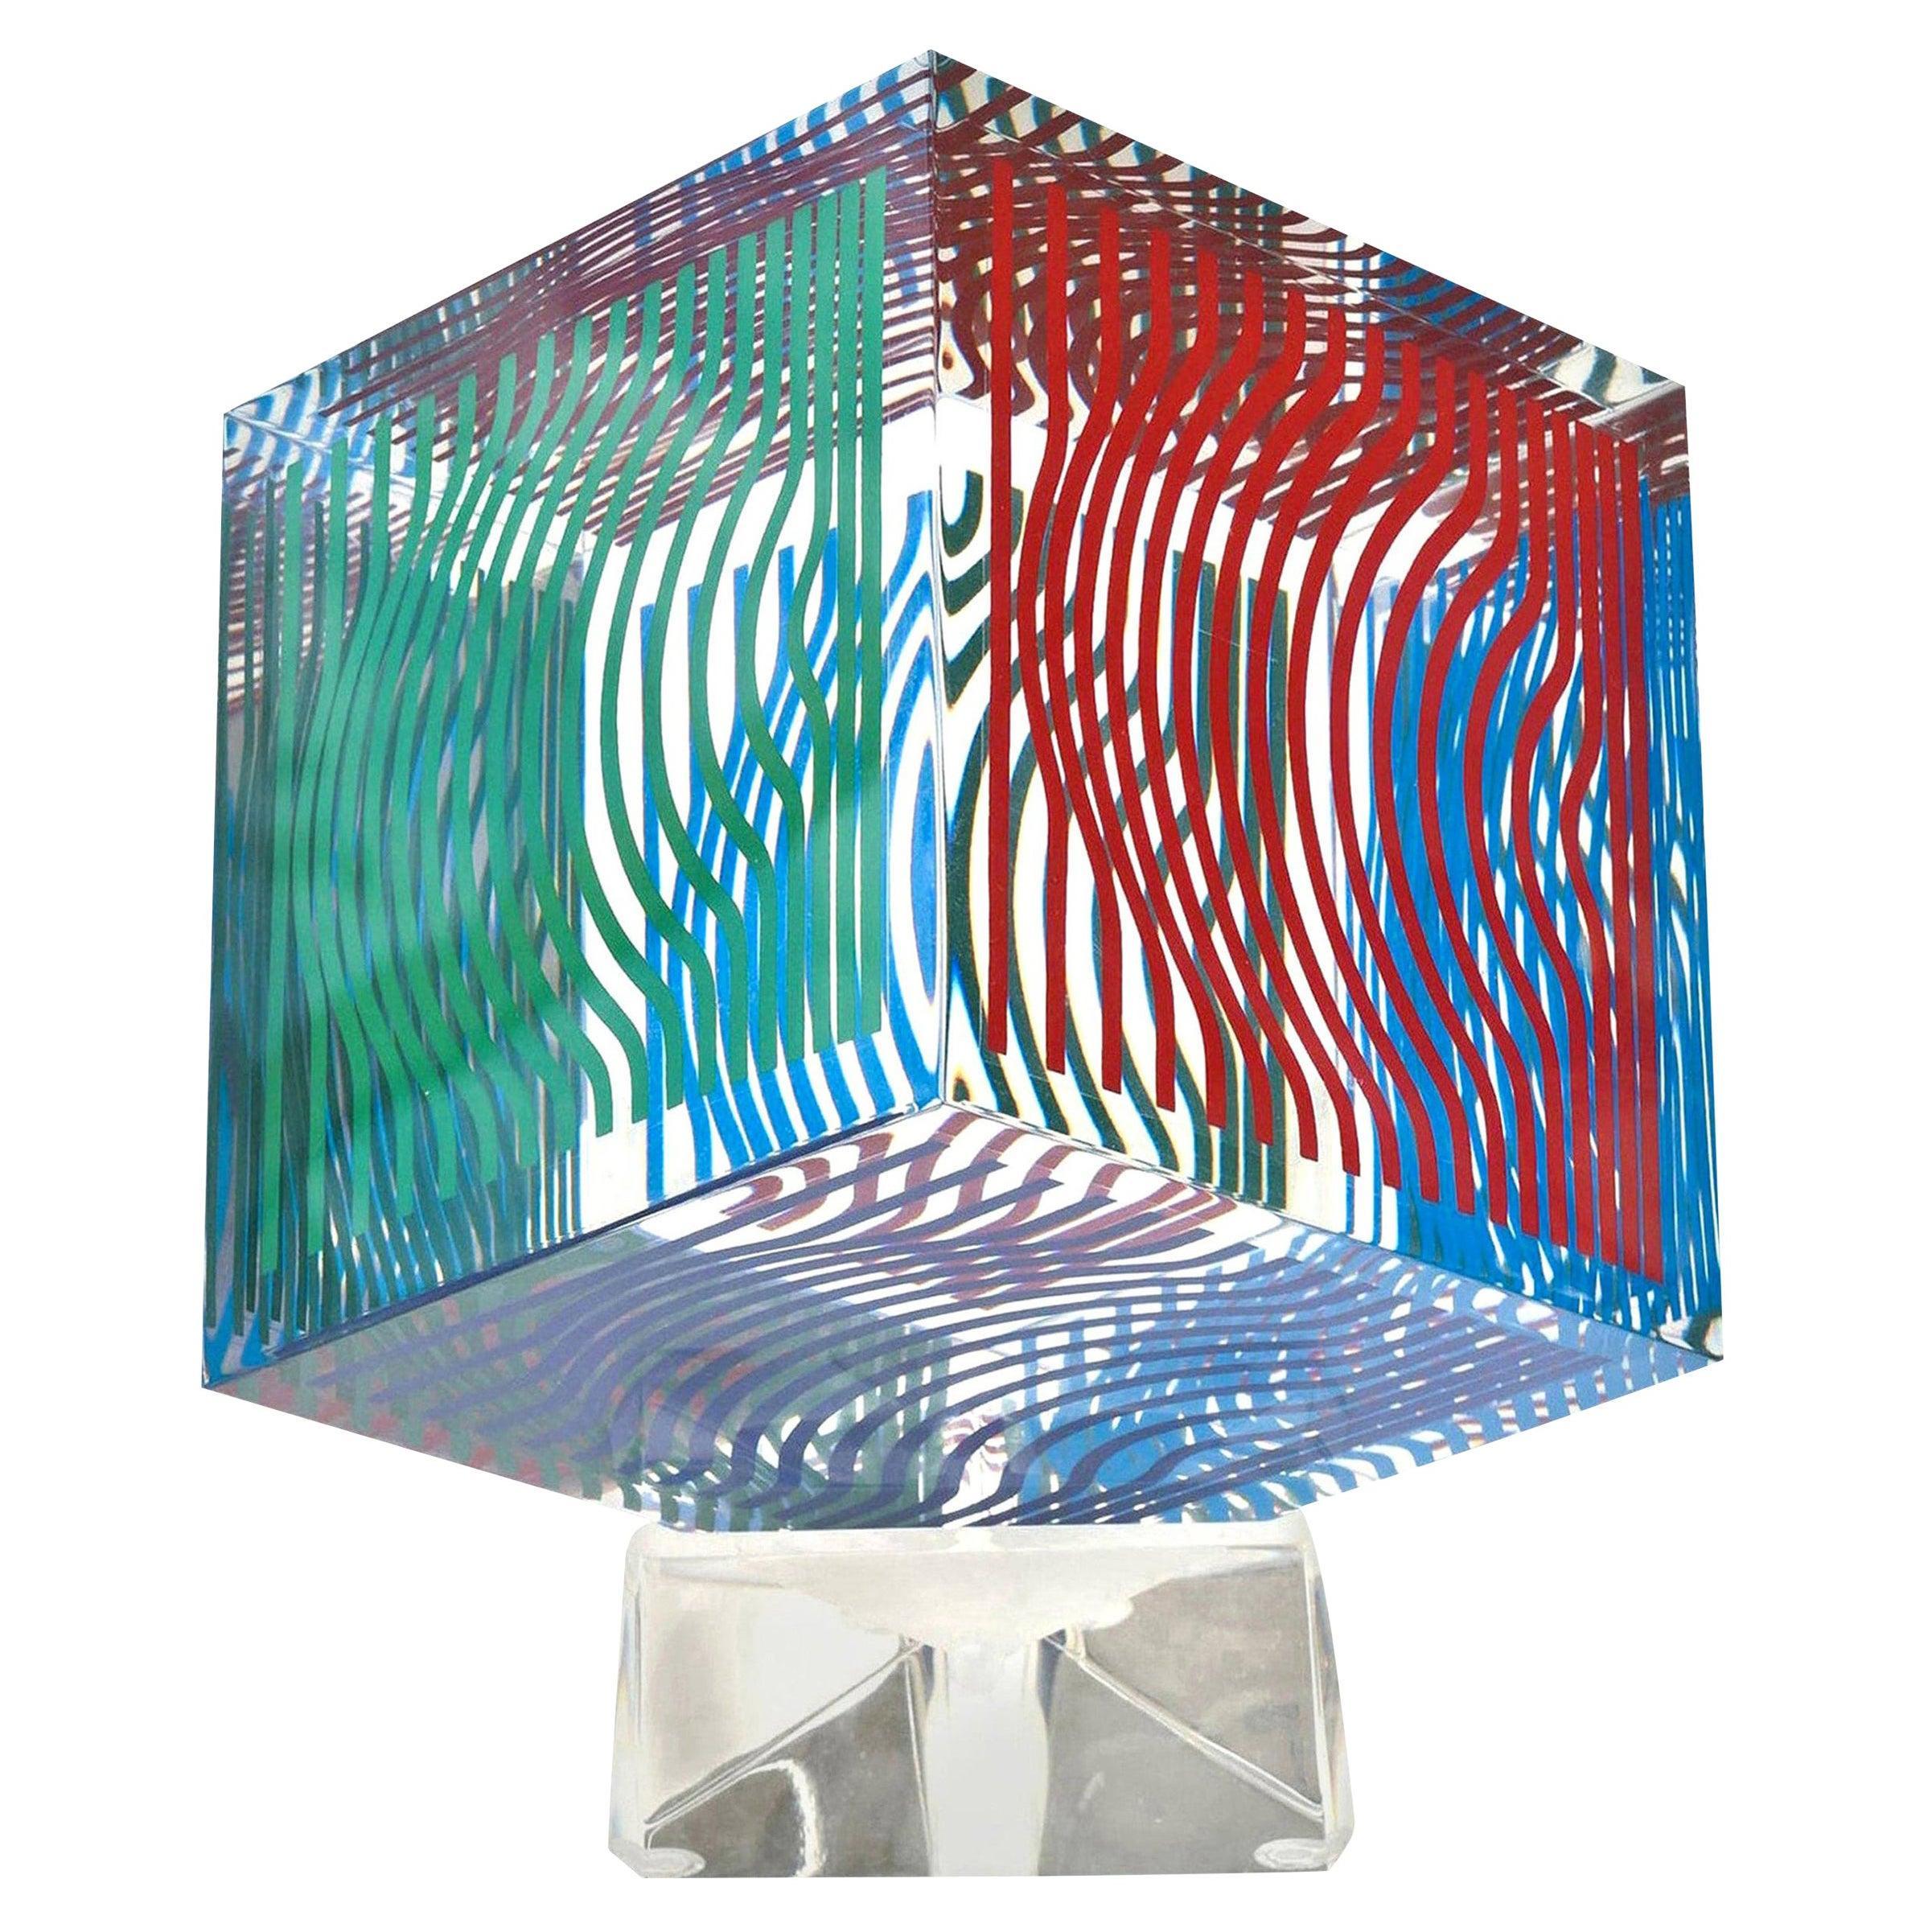 Victor Vasarely Op Art Acrylic Cube Sculpture Vintage